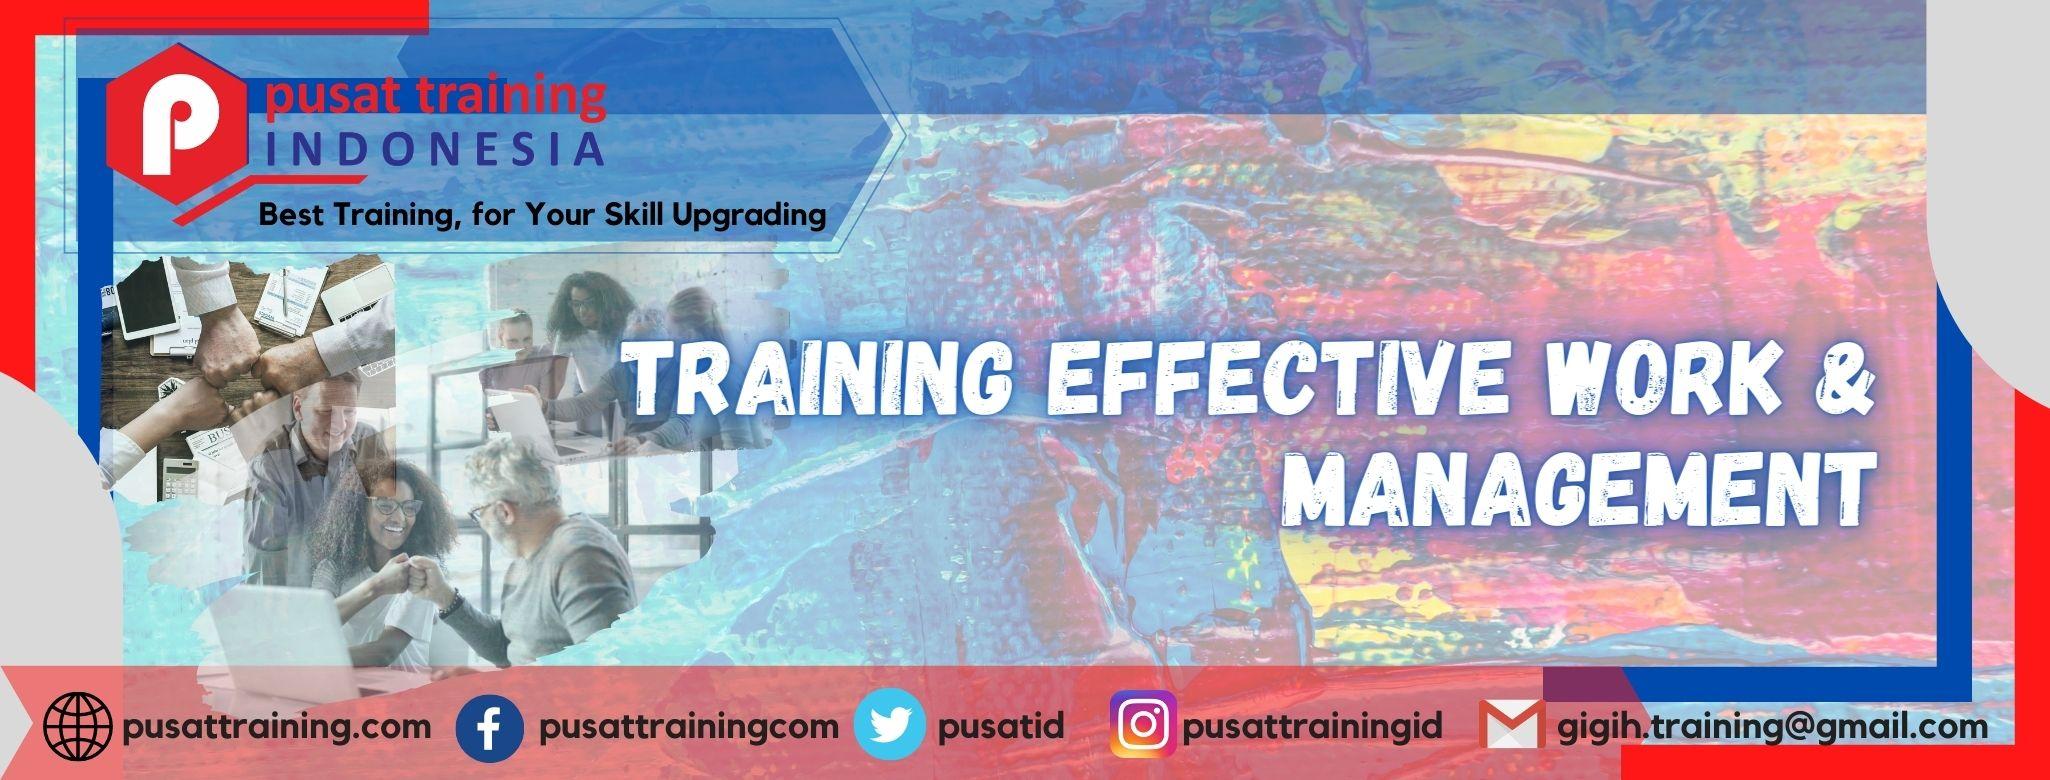 TRAINING EFFECTIVE WORK & MANAGEMENT